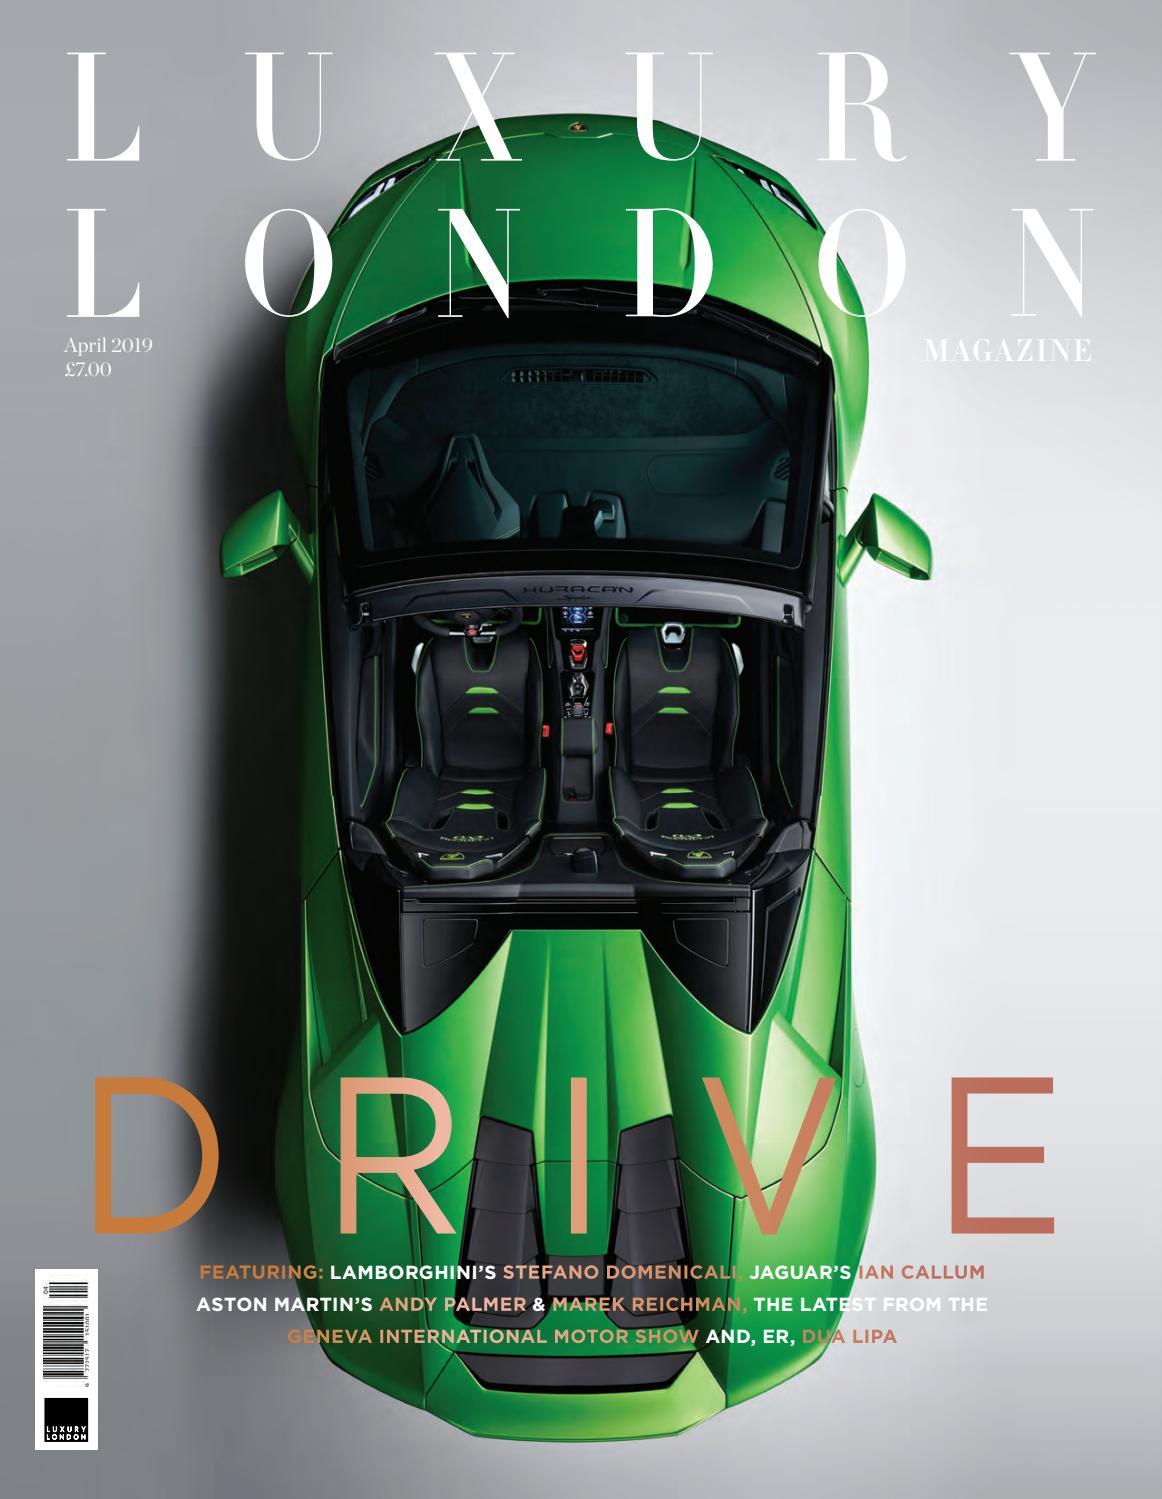 1bfa06834612 Luxury London Magazine April 2019 by Luxury London Media - issuu